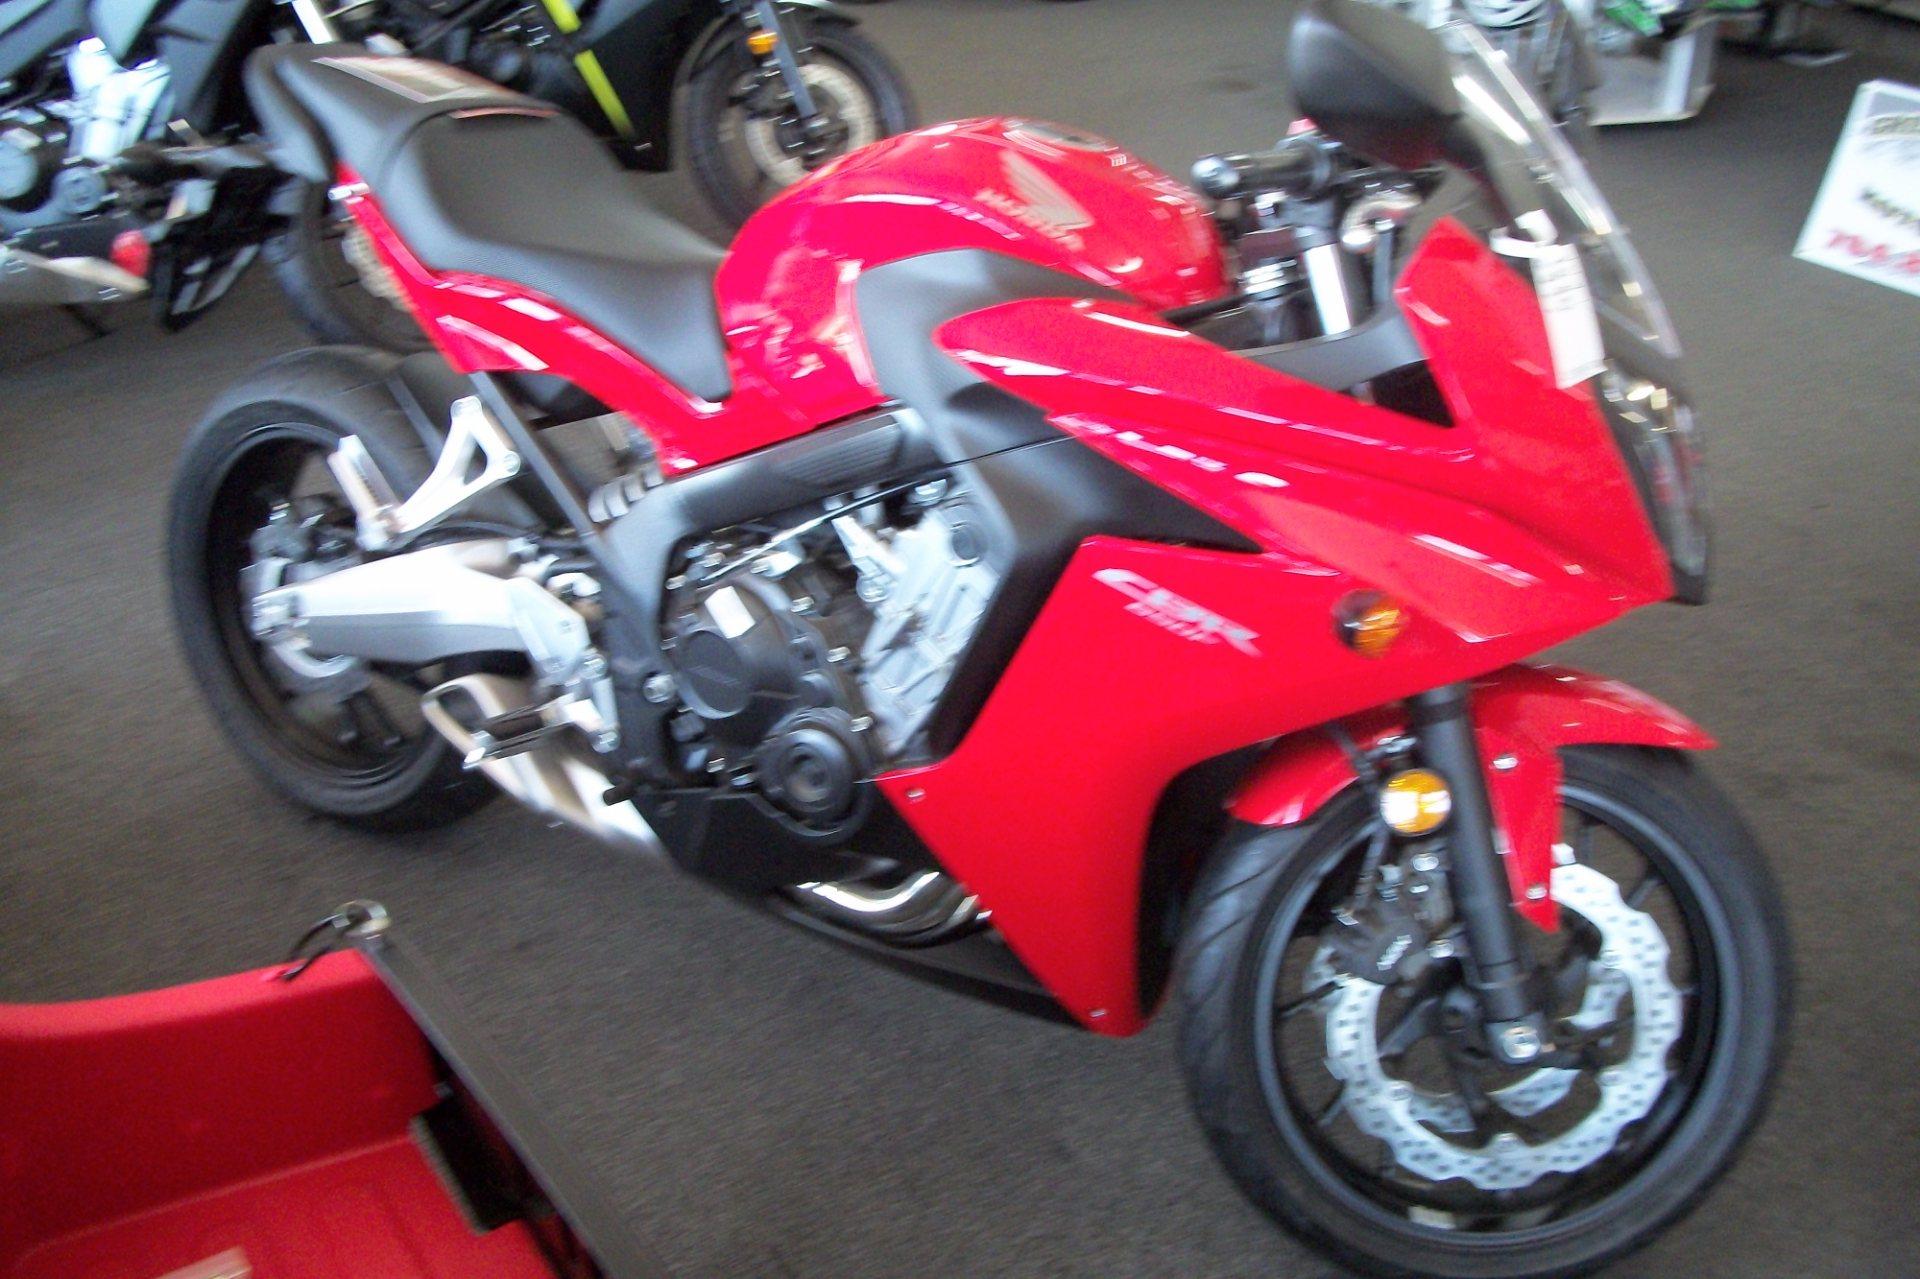 new 2014 honda cbr®650f motorcycles in statesville, nc | stock